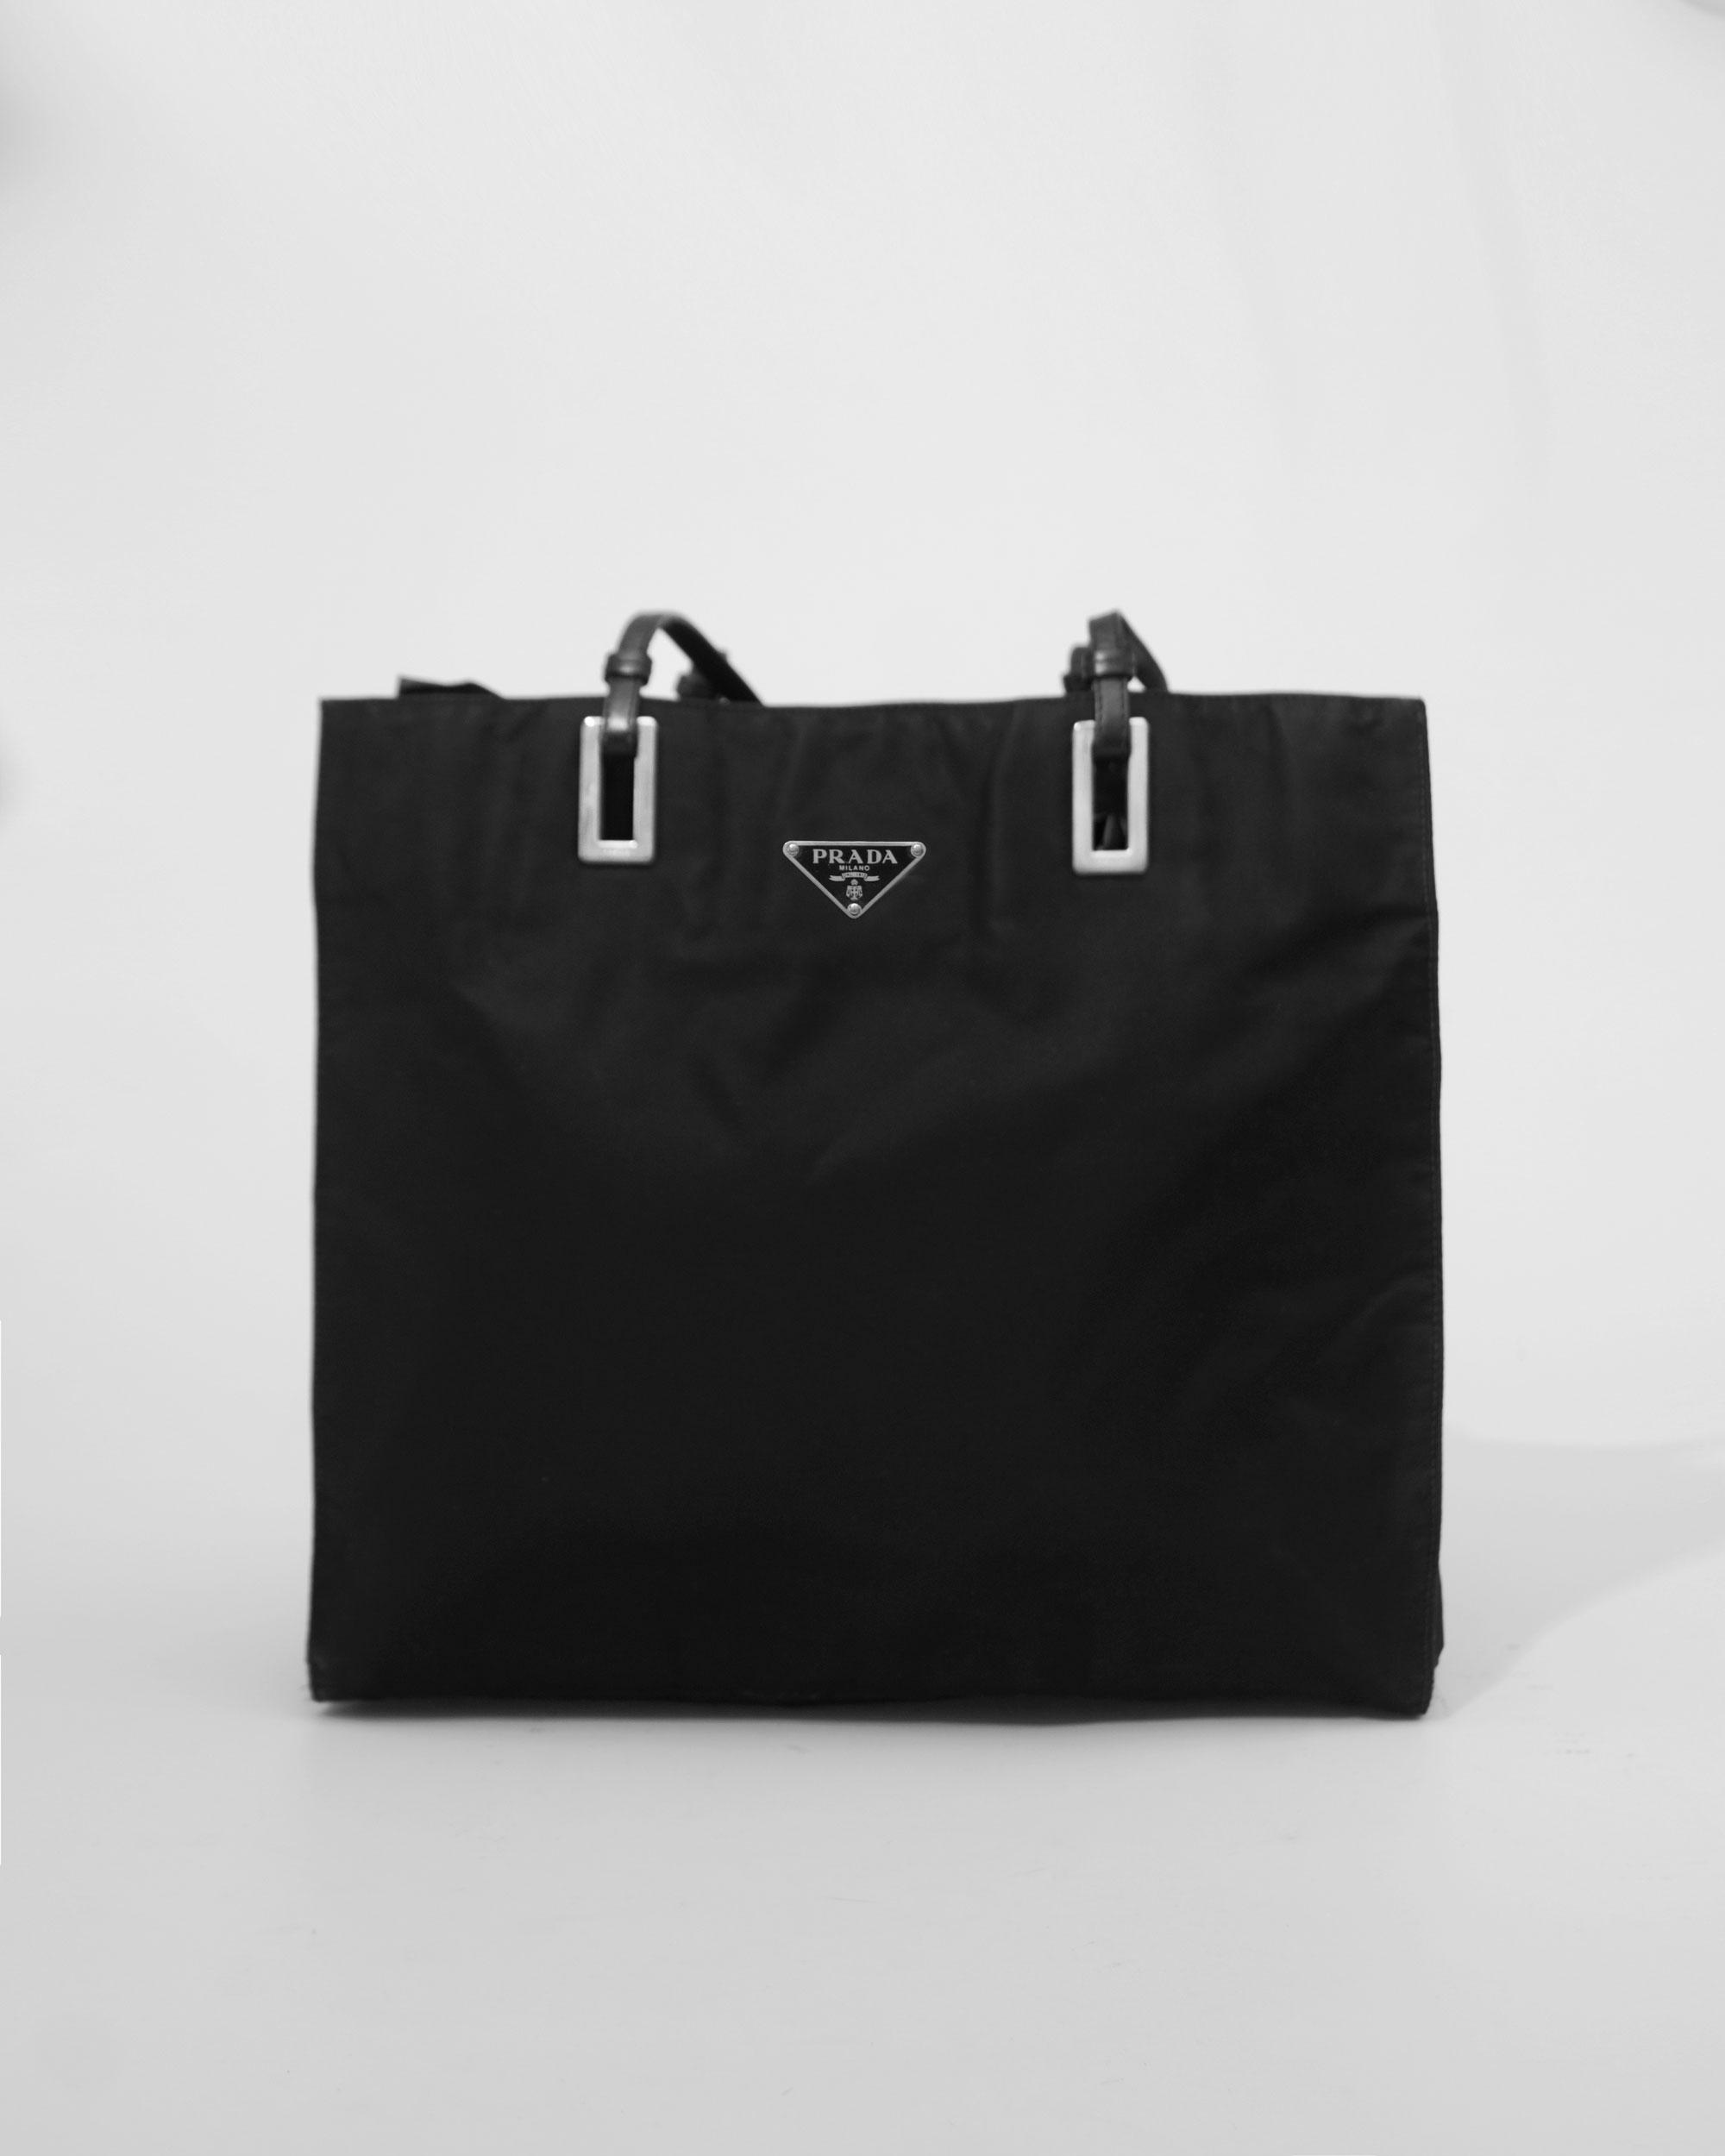 fb055c19523f Prada Nylon Tote Bag Shoulder Bag Black 4.jpg